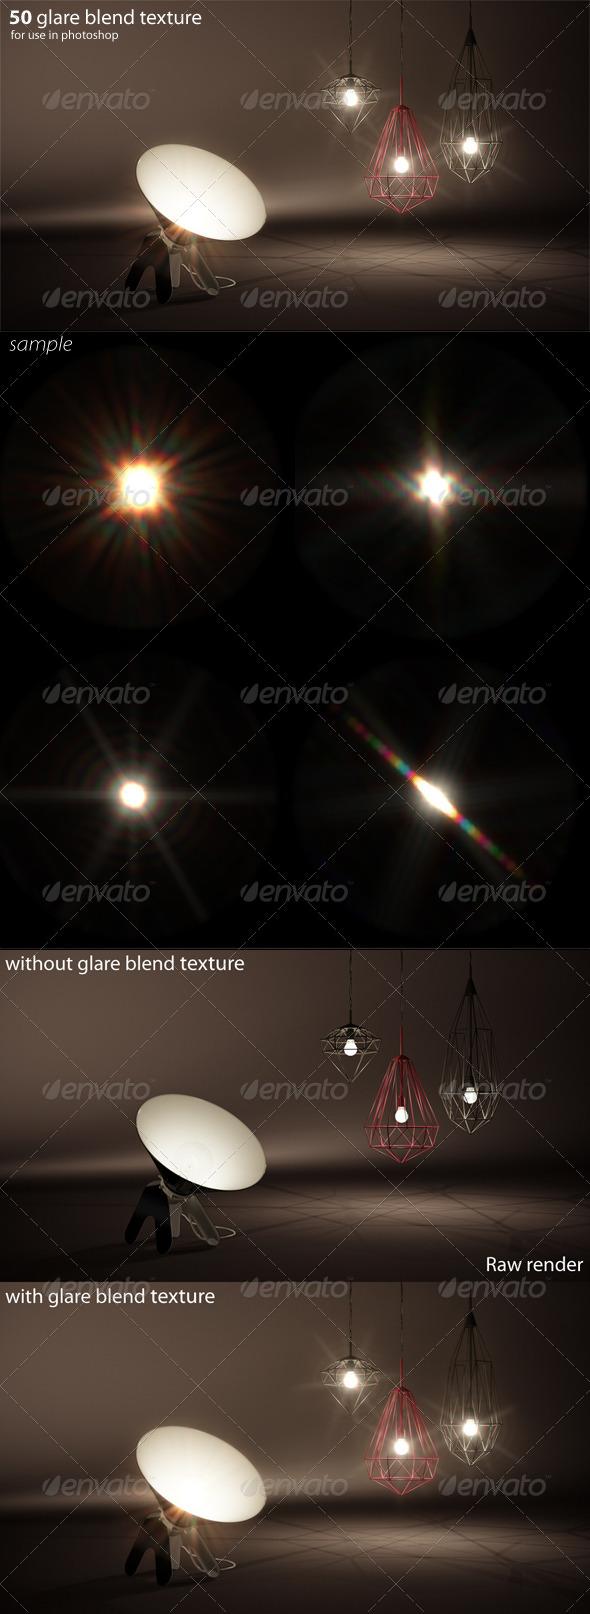 3DOcean 50 glare textures 5436322